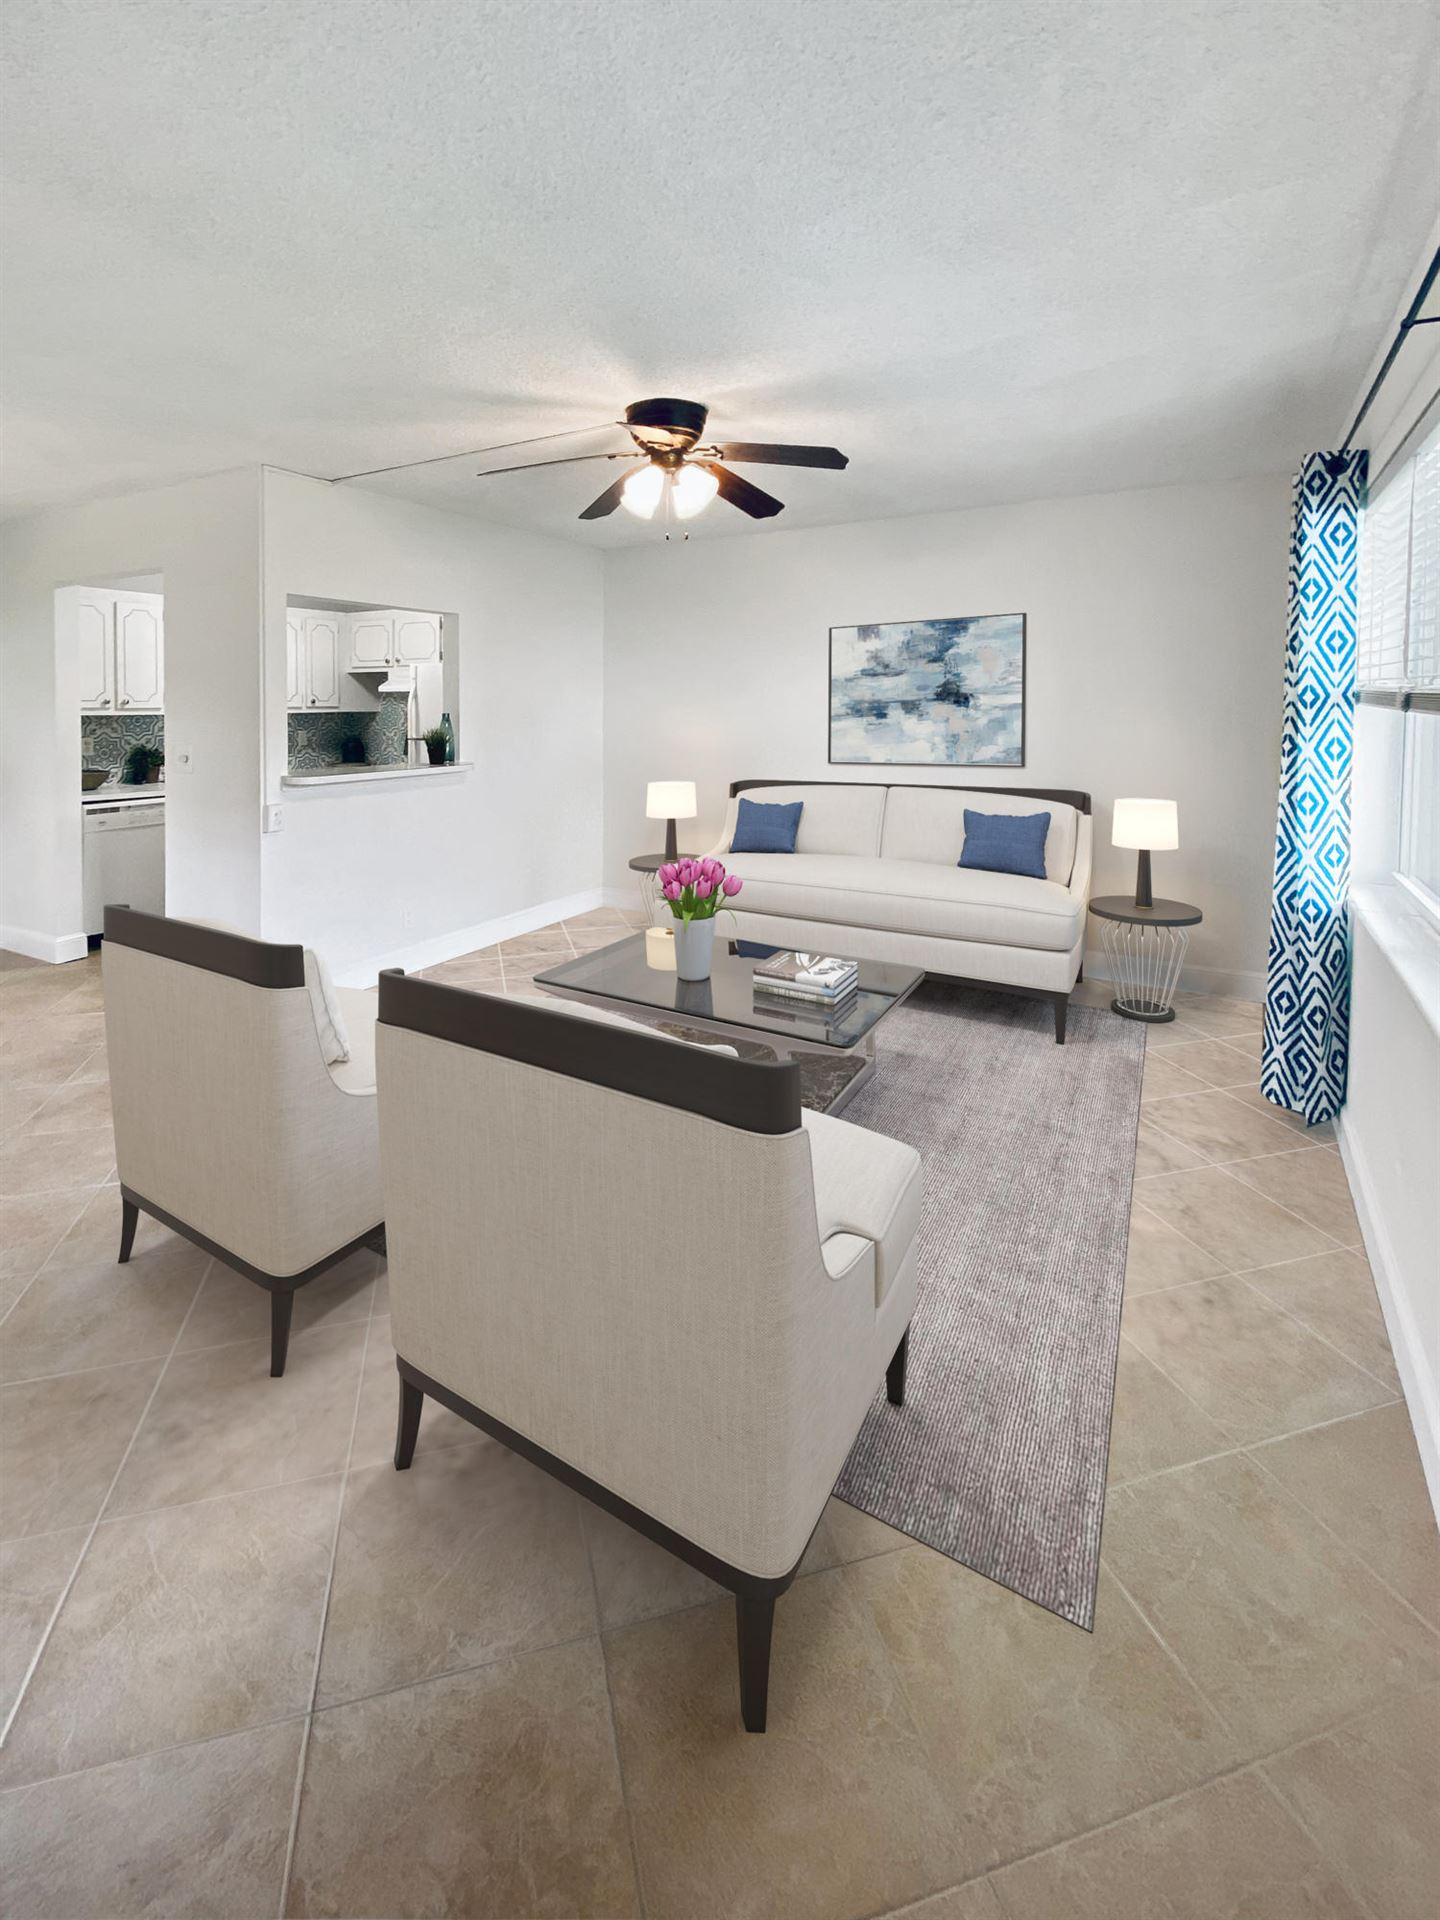 210 Horizons E #108, Boynton Beach, FL 33435 - #: RX-10640682